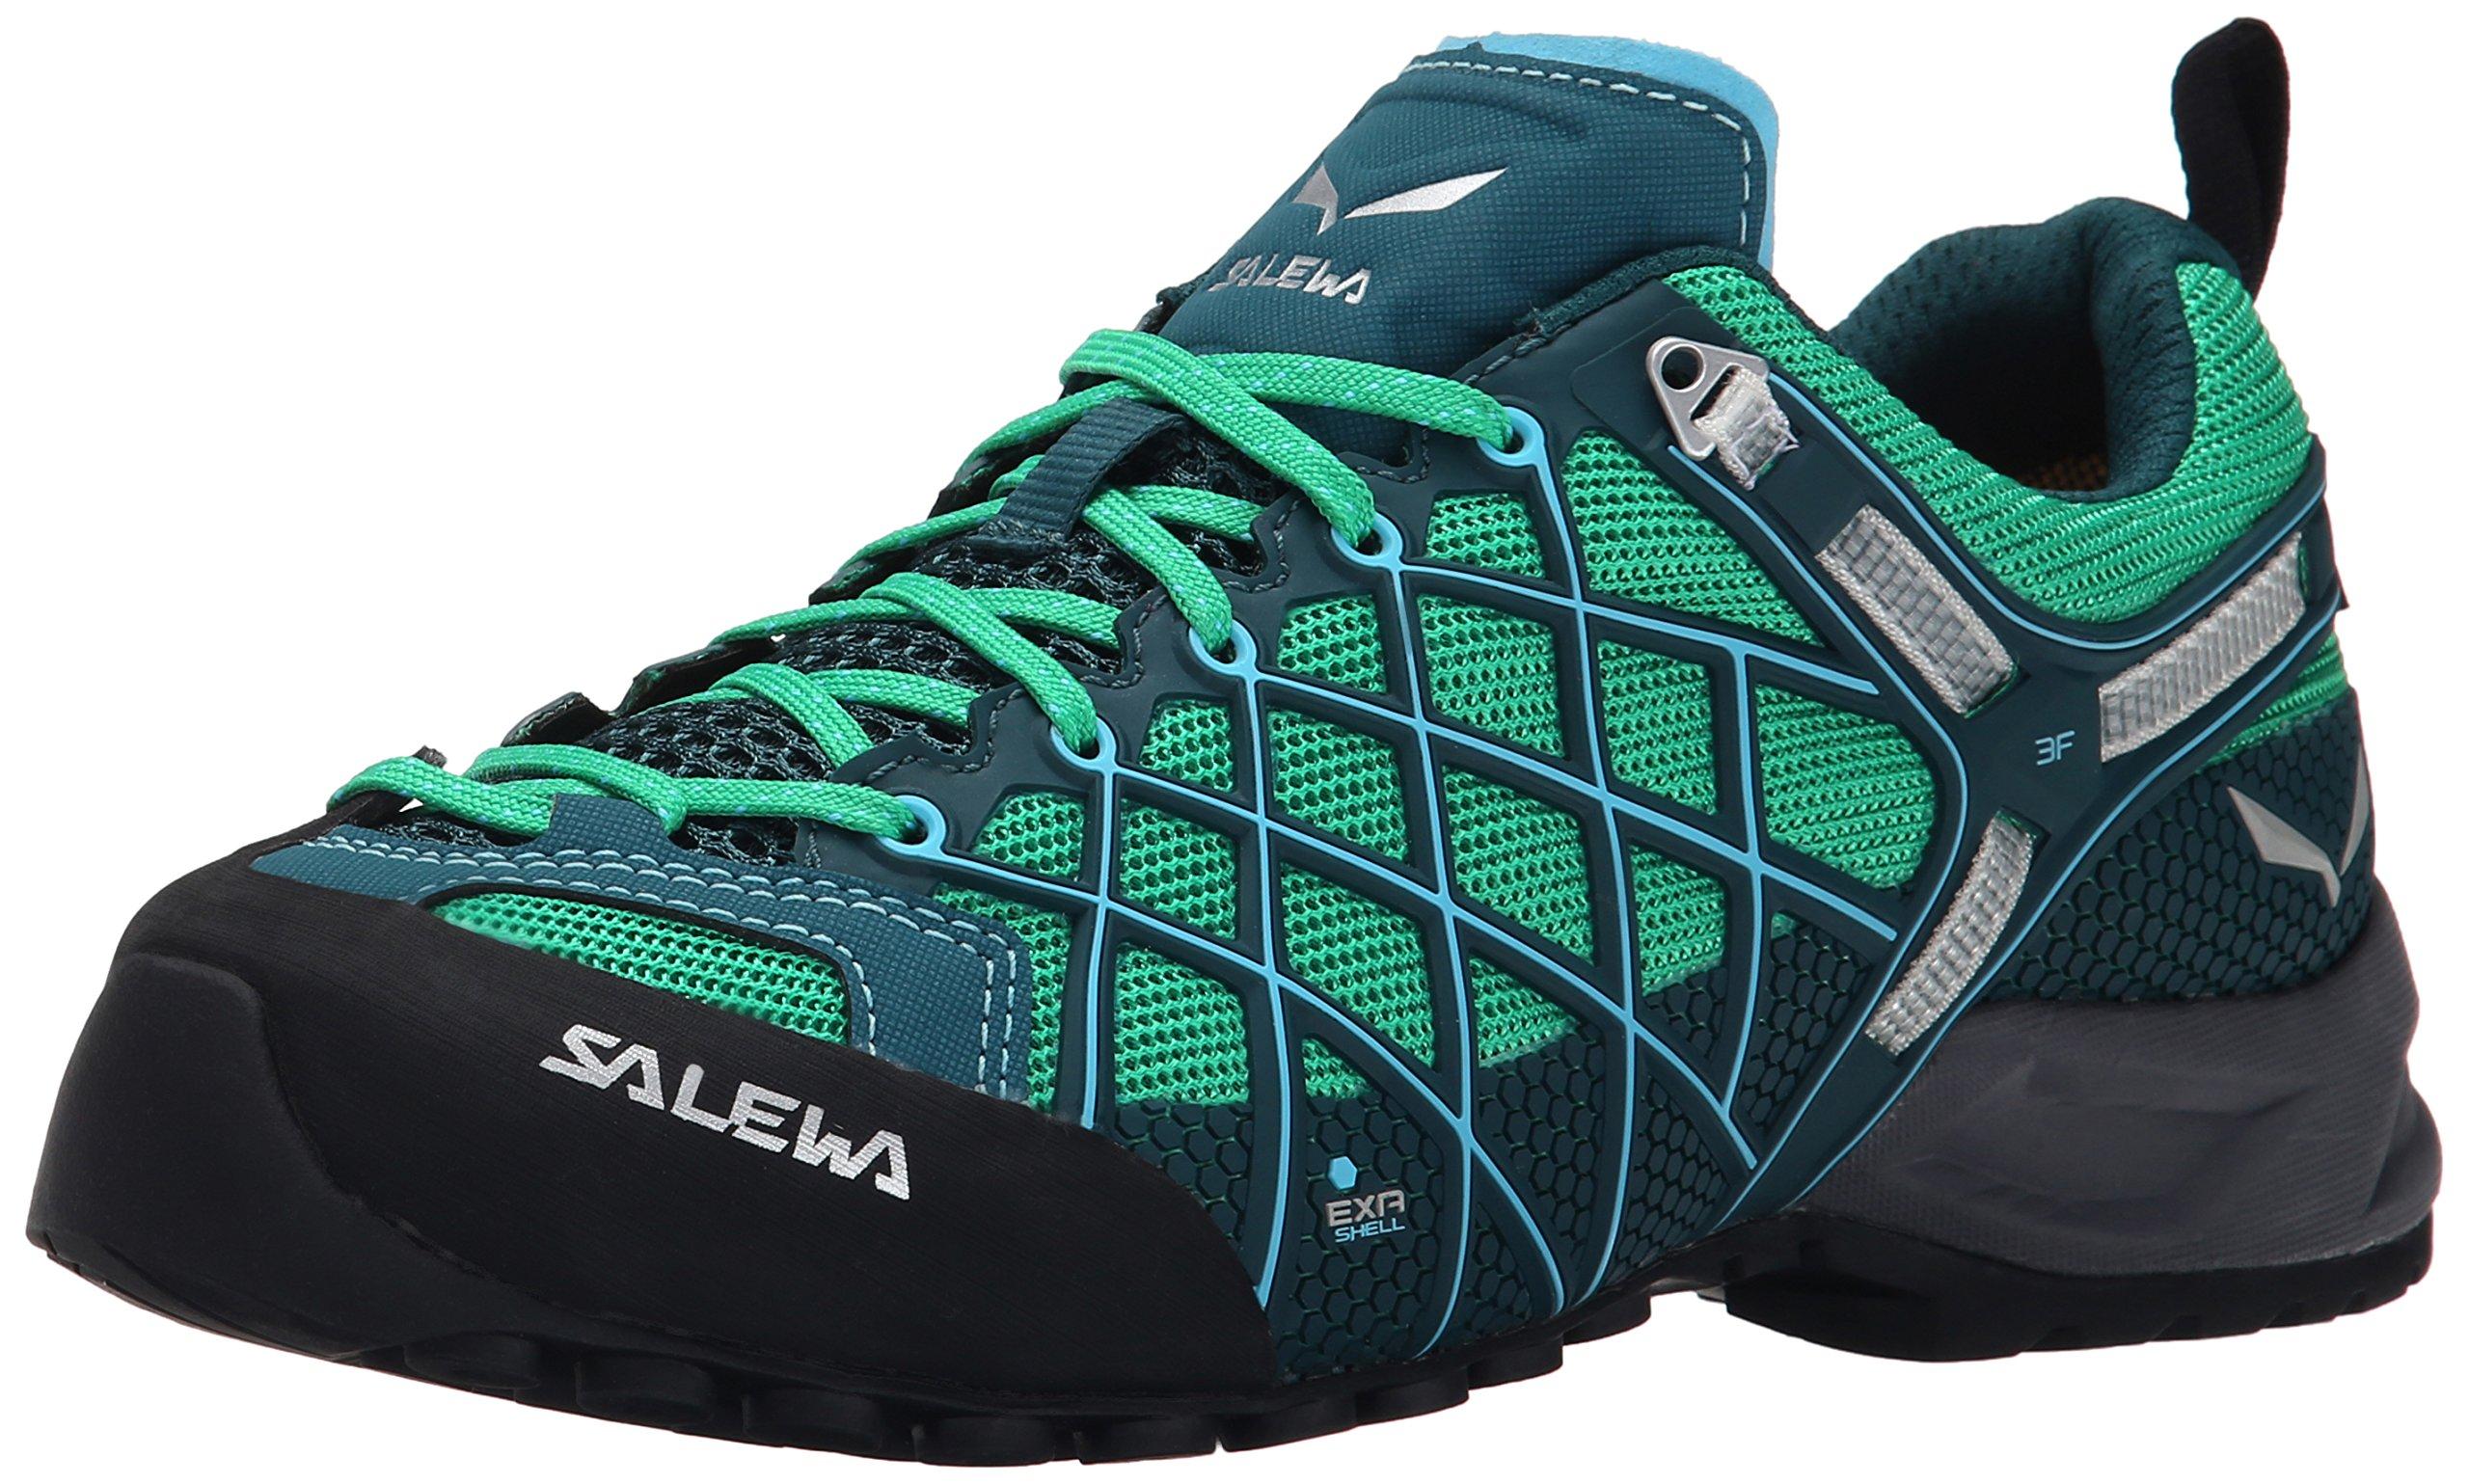 Salewa Women's Wildfire S GTX Technical Approach Shoe, Cypress/River Blue, 8.5 M US